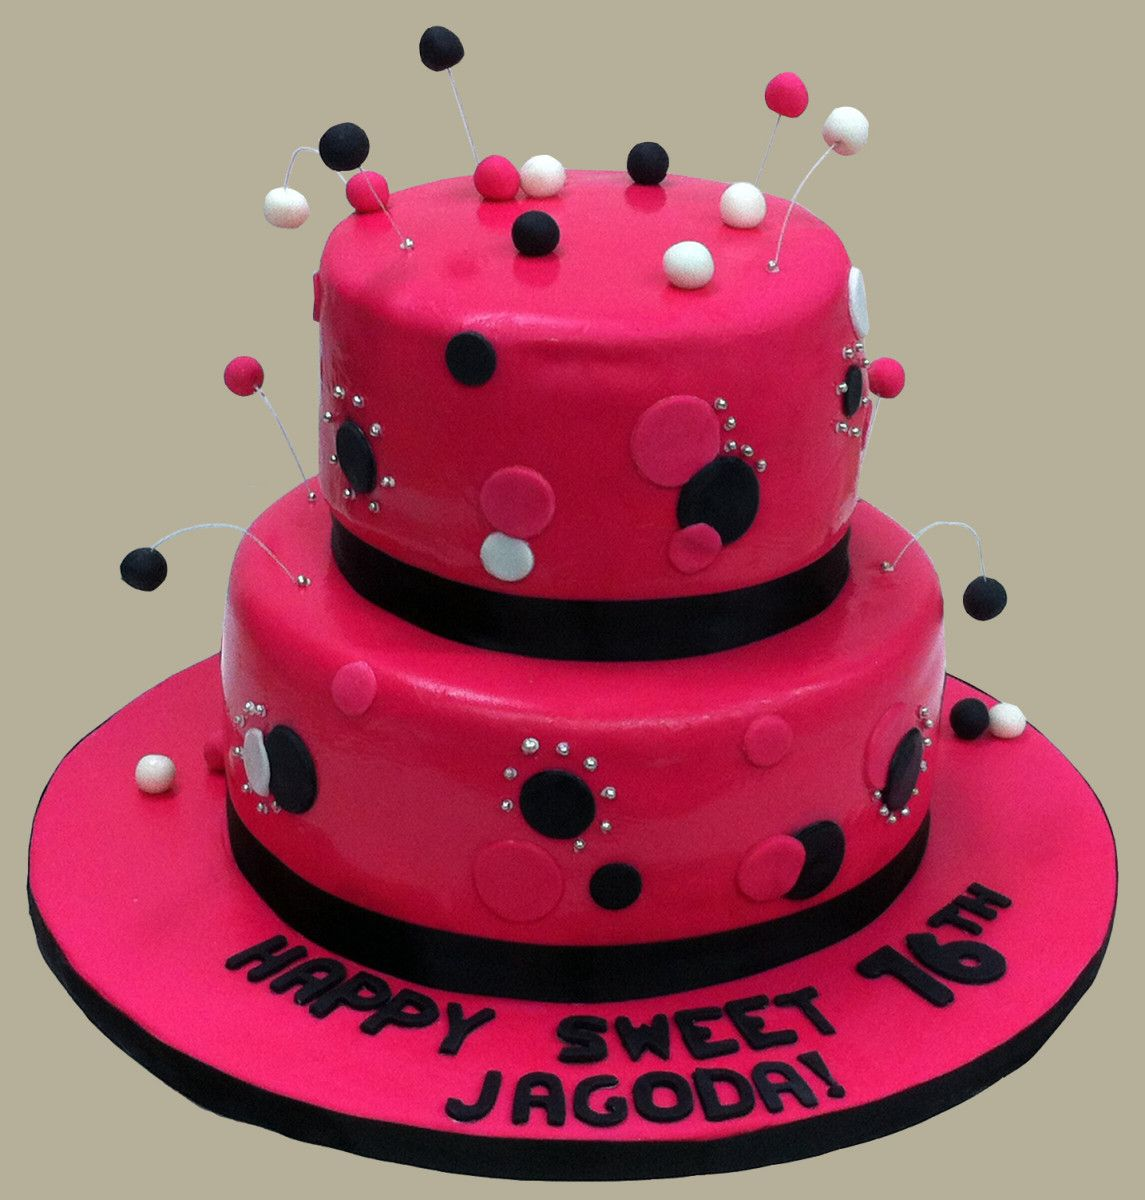 38 Walmart Bakery Birthday Cake Design (12) Cake Design